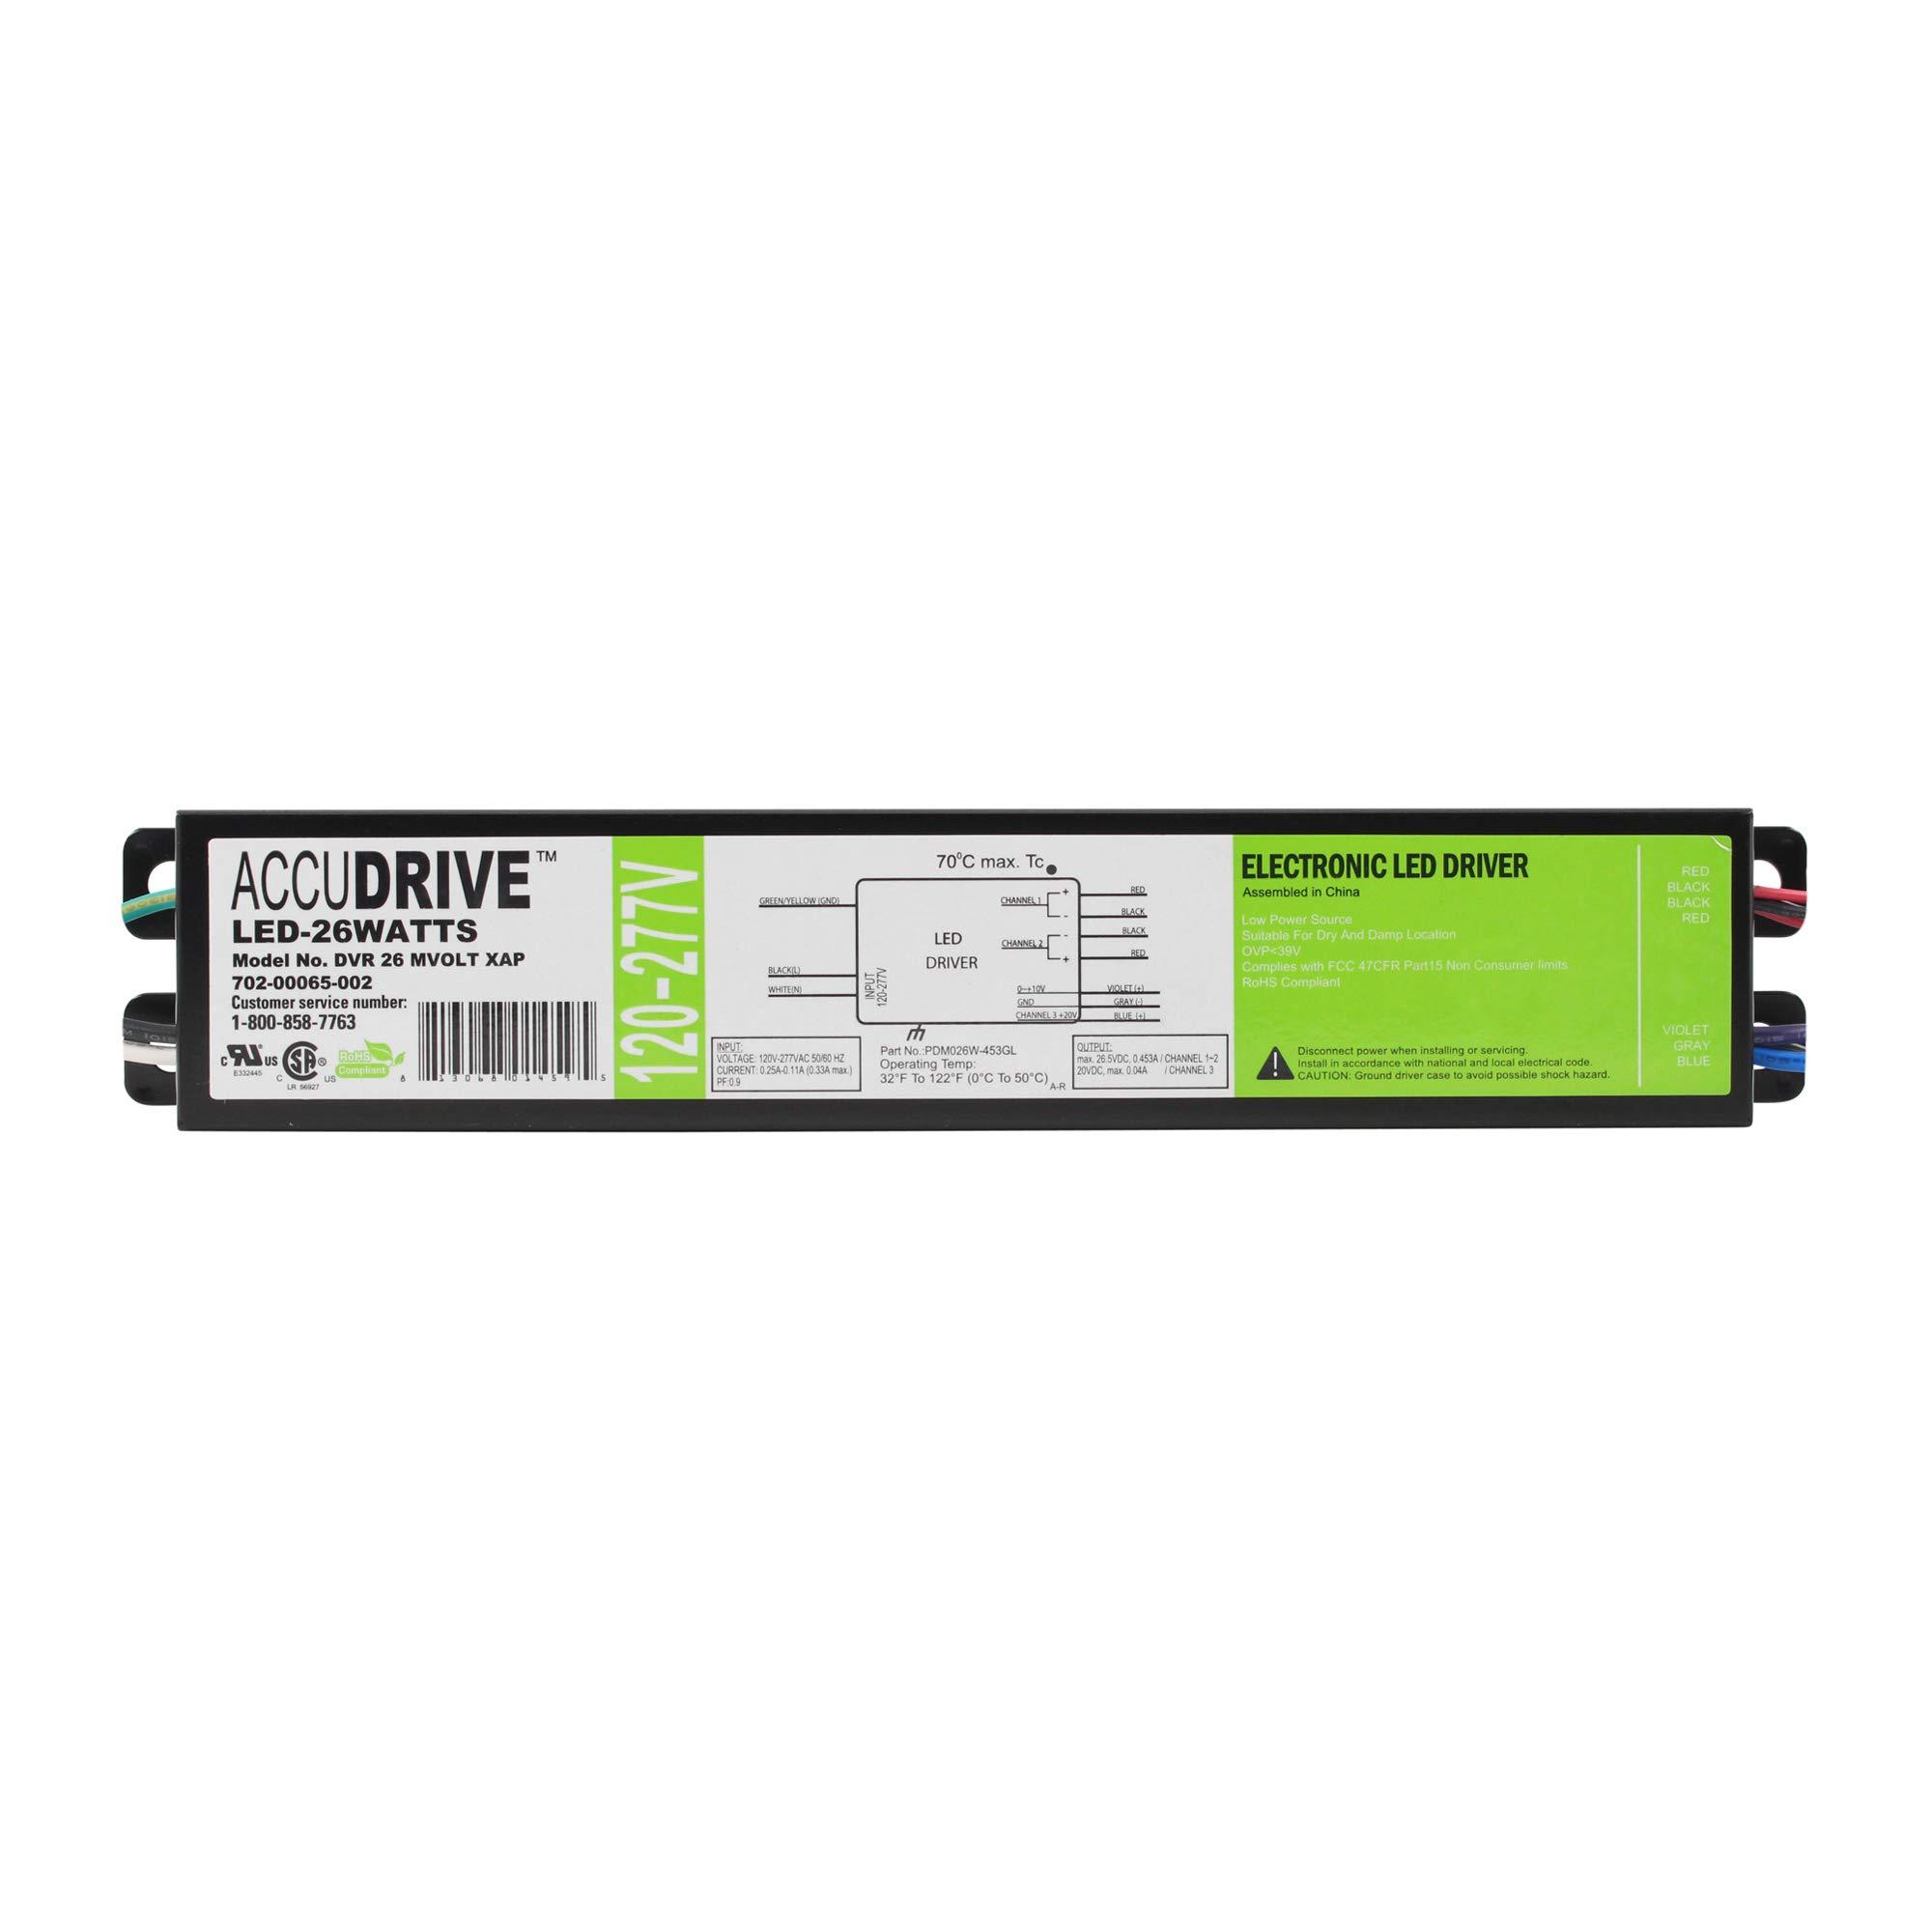 AccuDrive DVR-26-MVOLT-XAP Dimmable LED Driver, 26-Watt, 0-10V, 120/277VAC